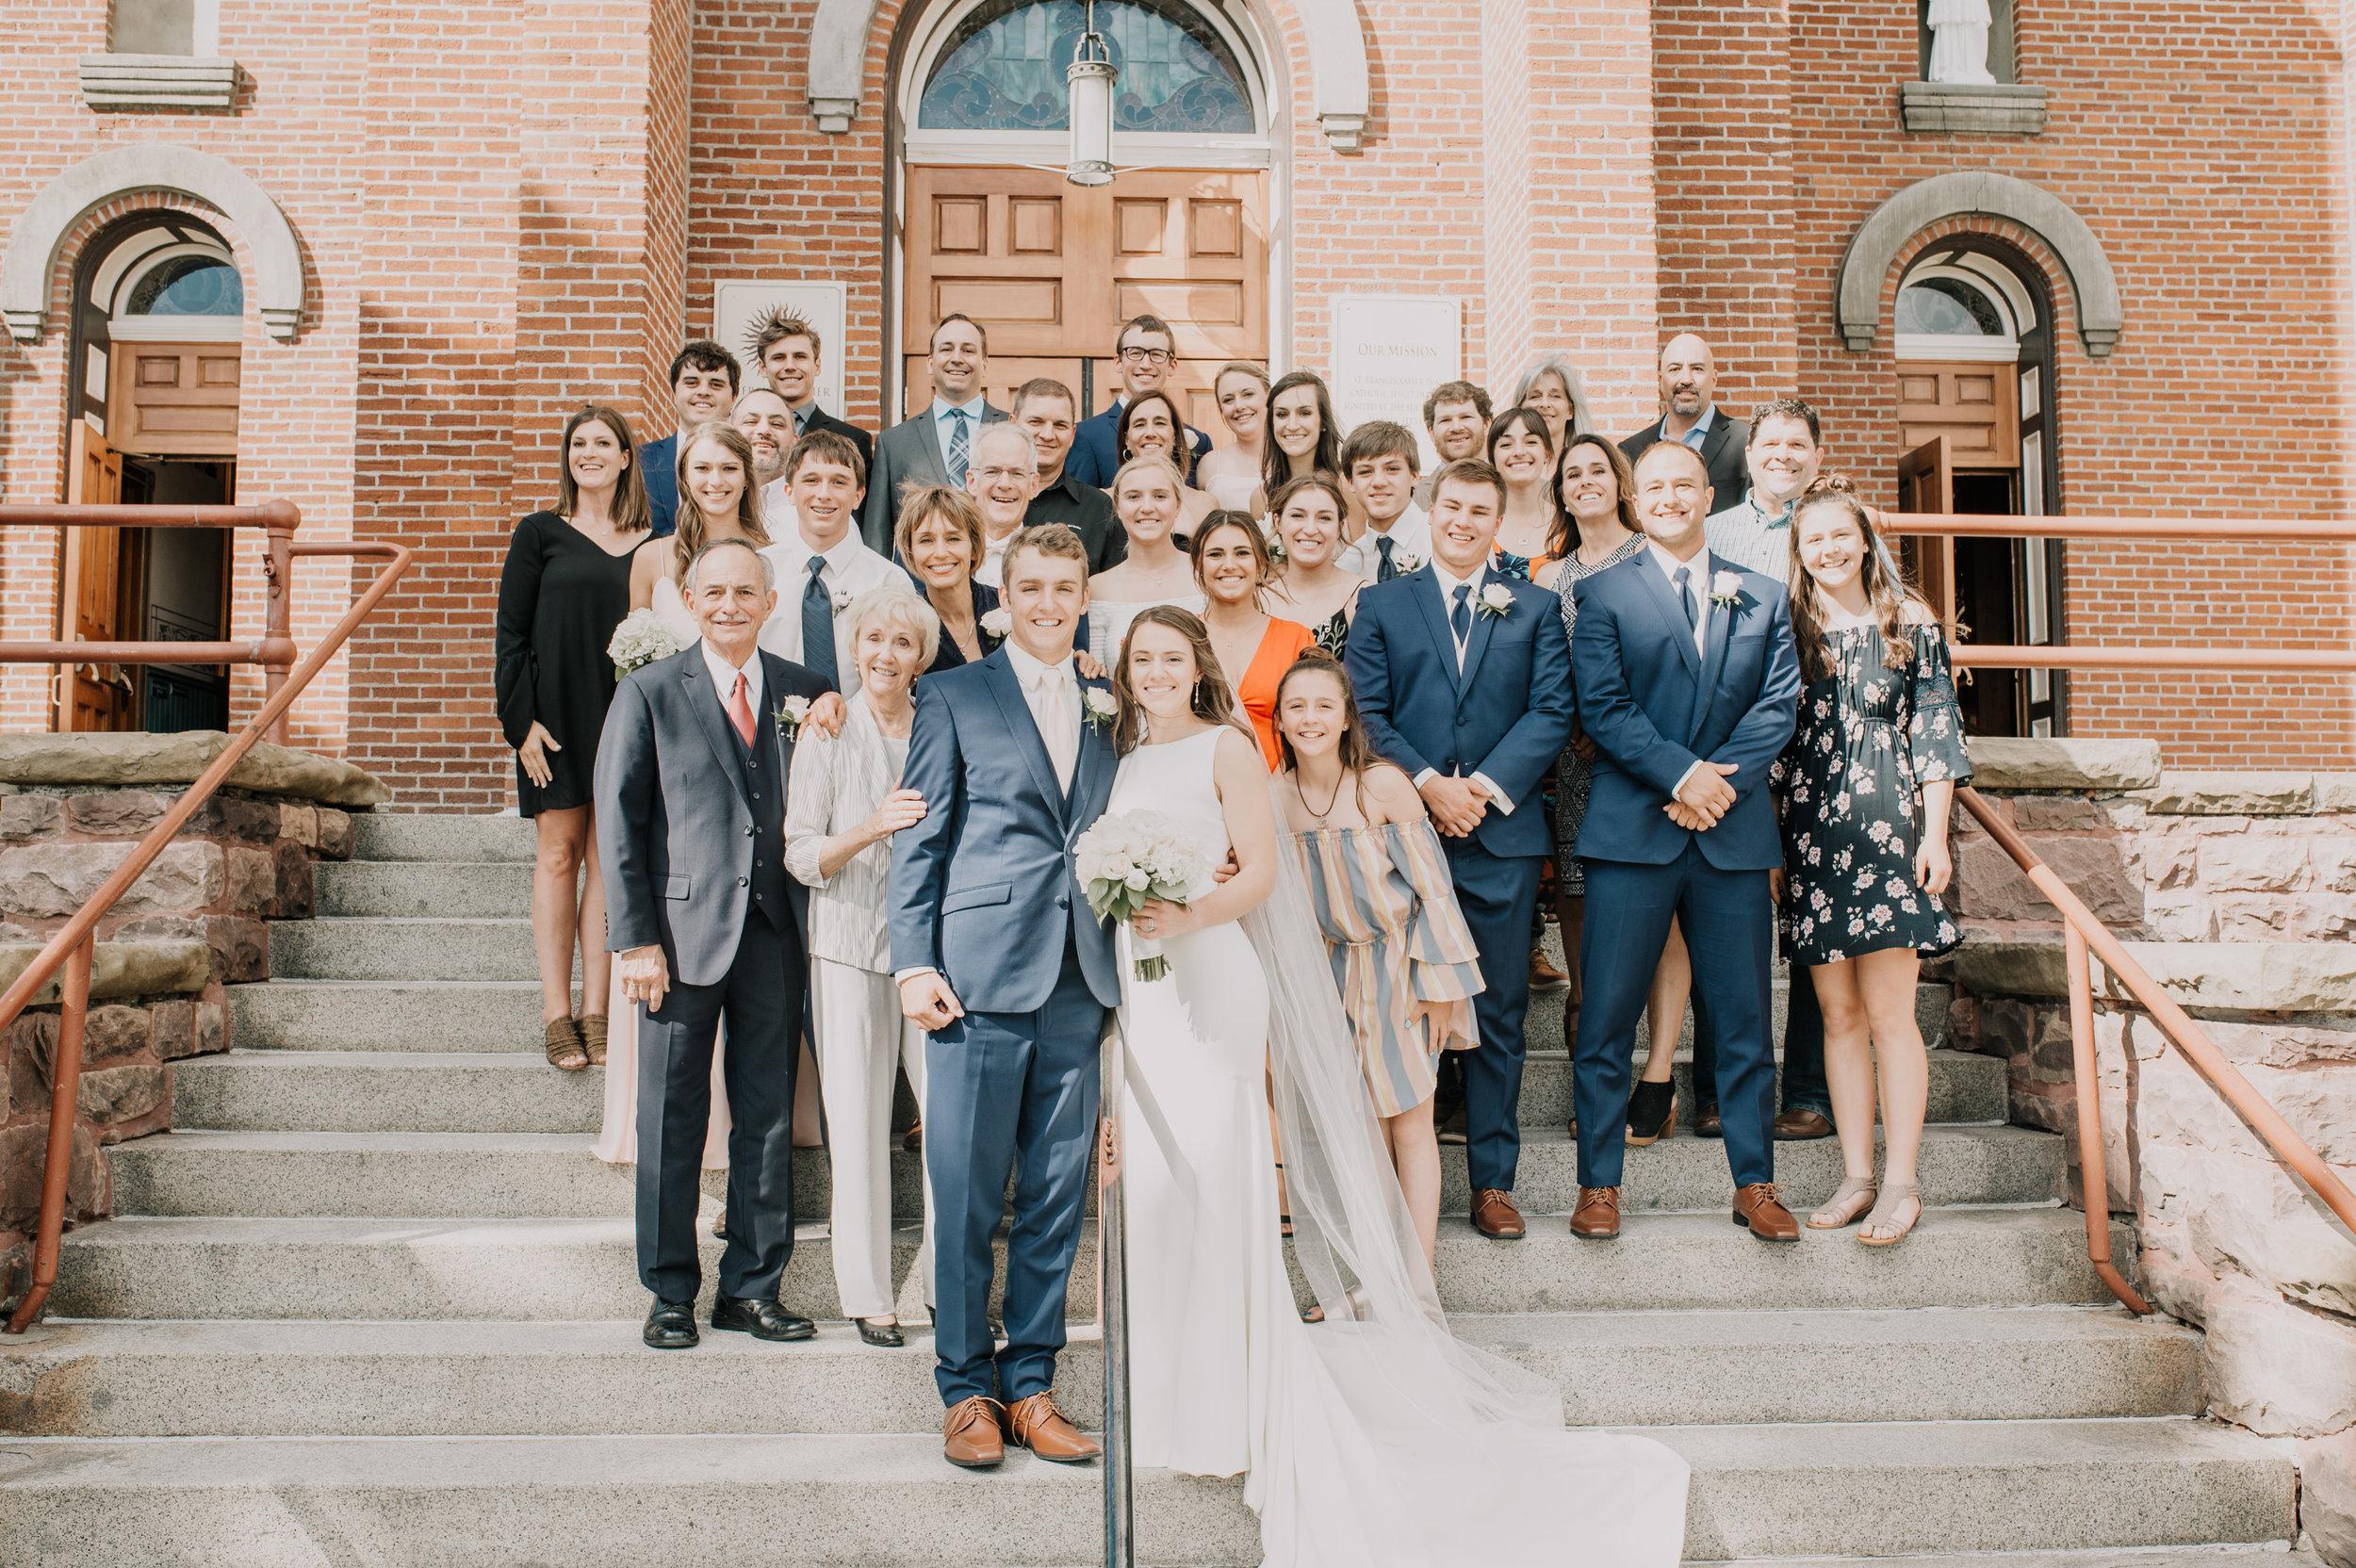 450 Montana Wedding Photographer_St. Francis Wedding_Tifani Zanto + Ryan Burke -6713.jpg